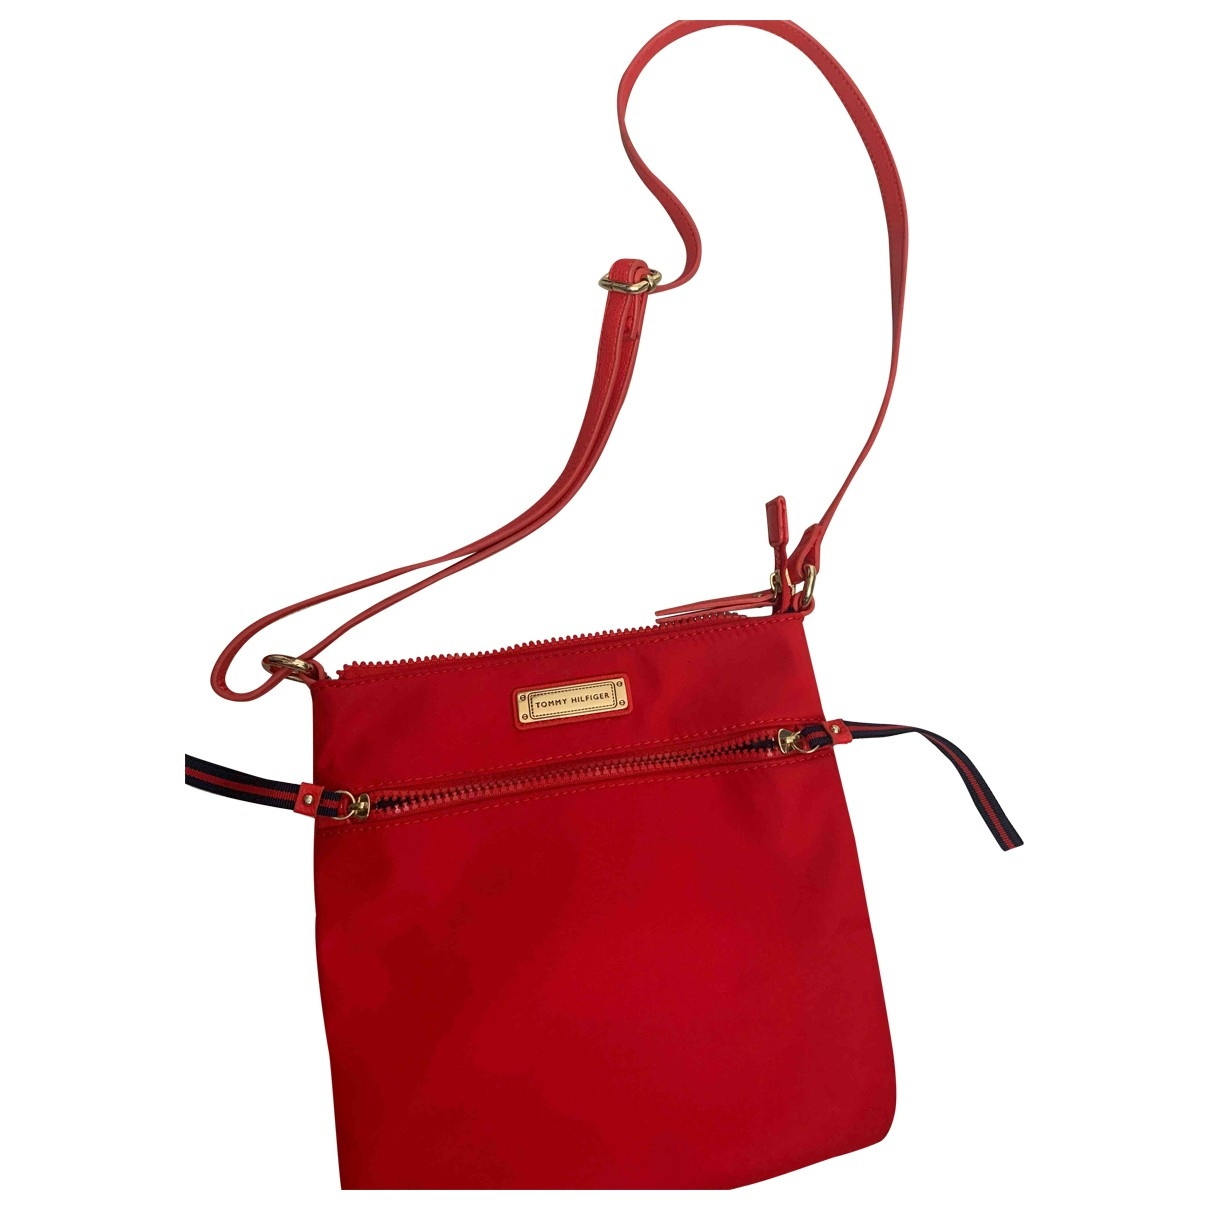 Tommy Hilfiger \N Red handbag for Women \N